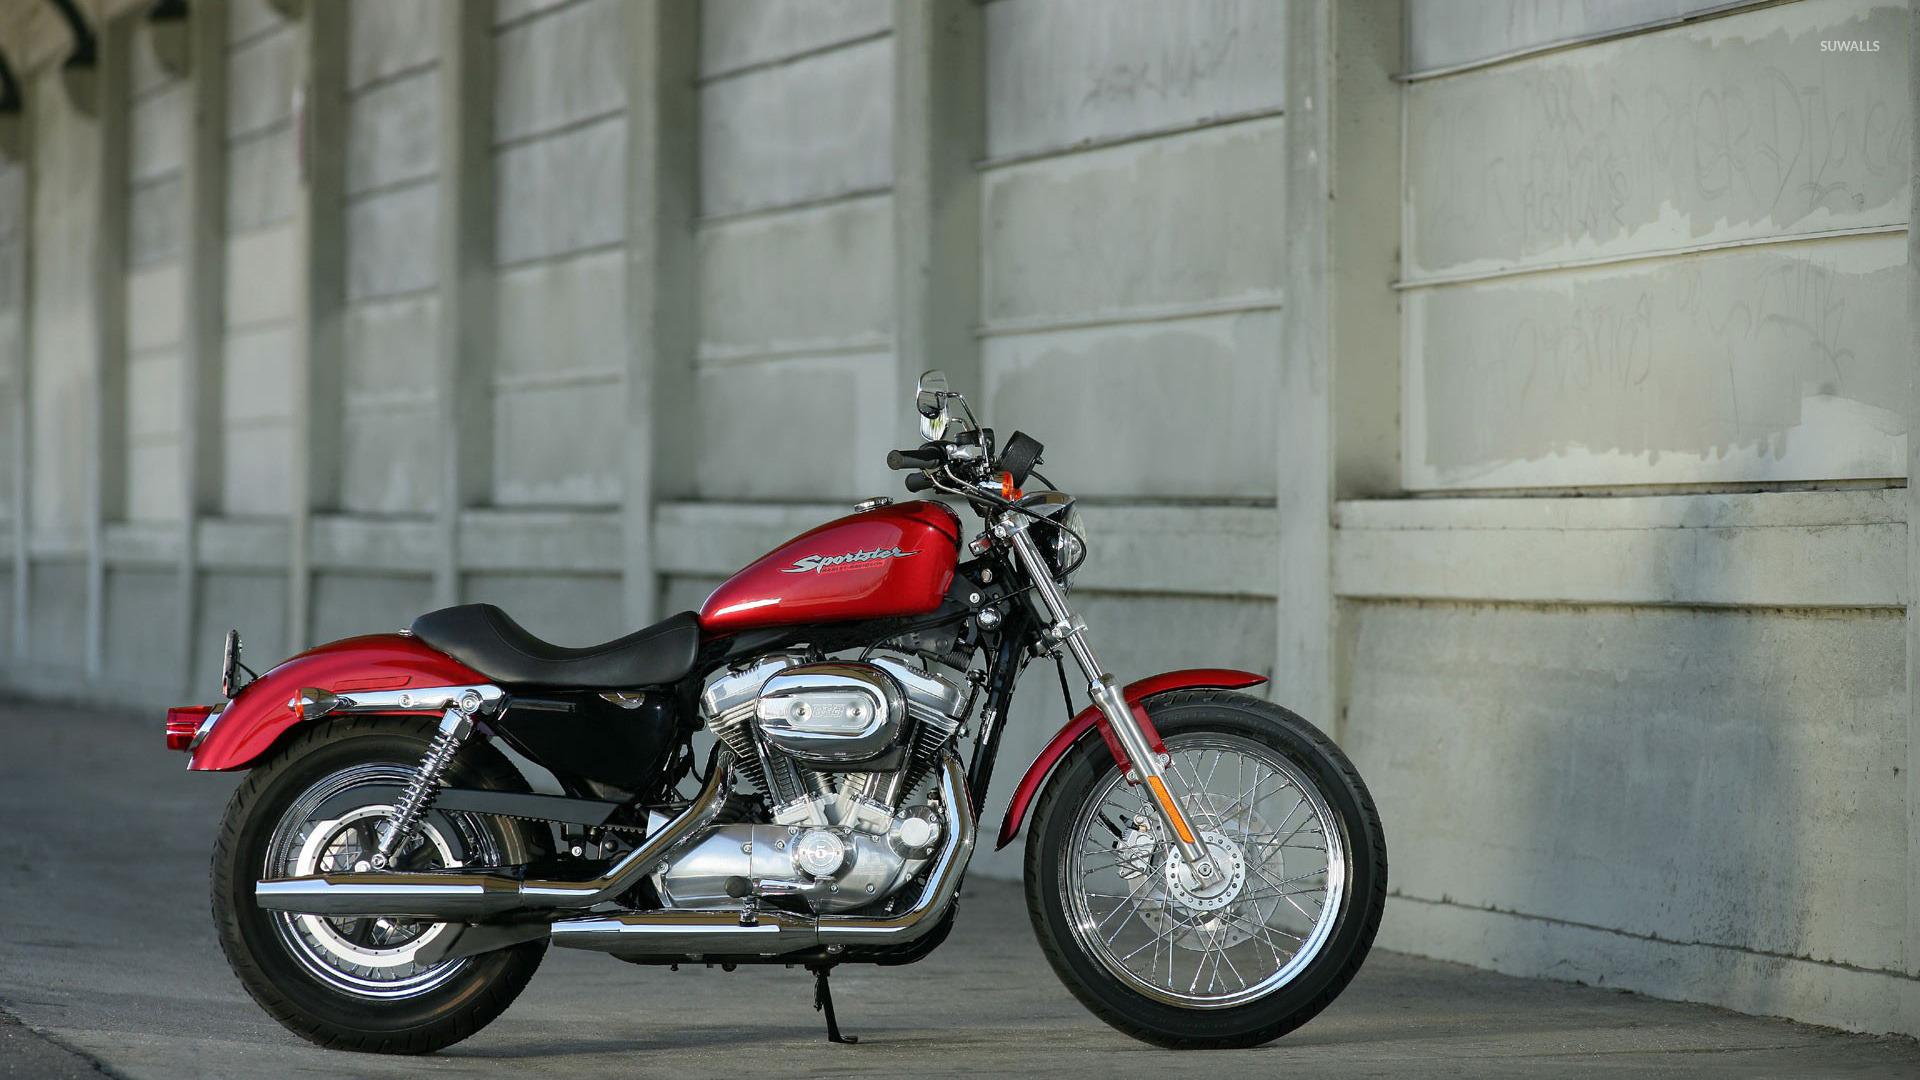 Top Wallpaper High Resolution Harley Davidson - harley-davidson-sportster-32499-1920x1080  Trends_778185.jpg